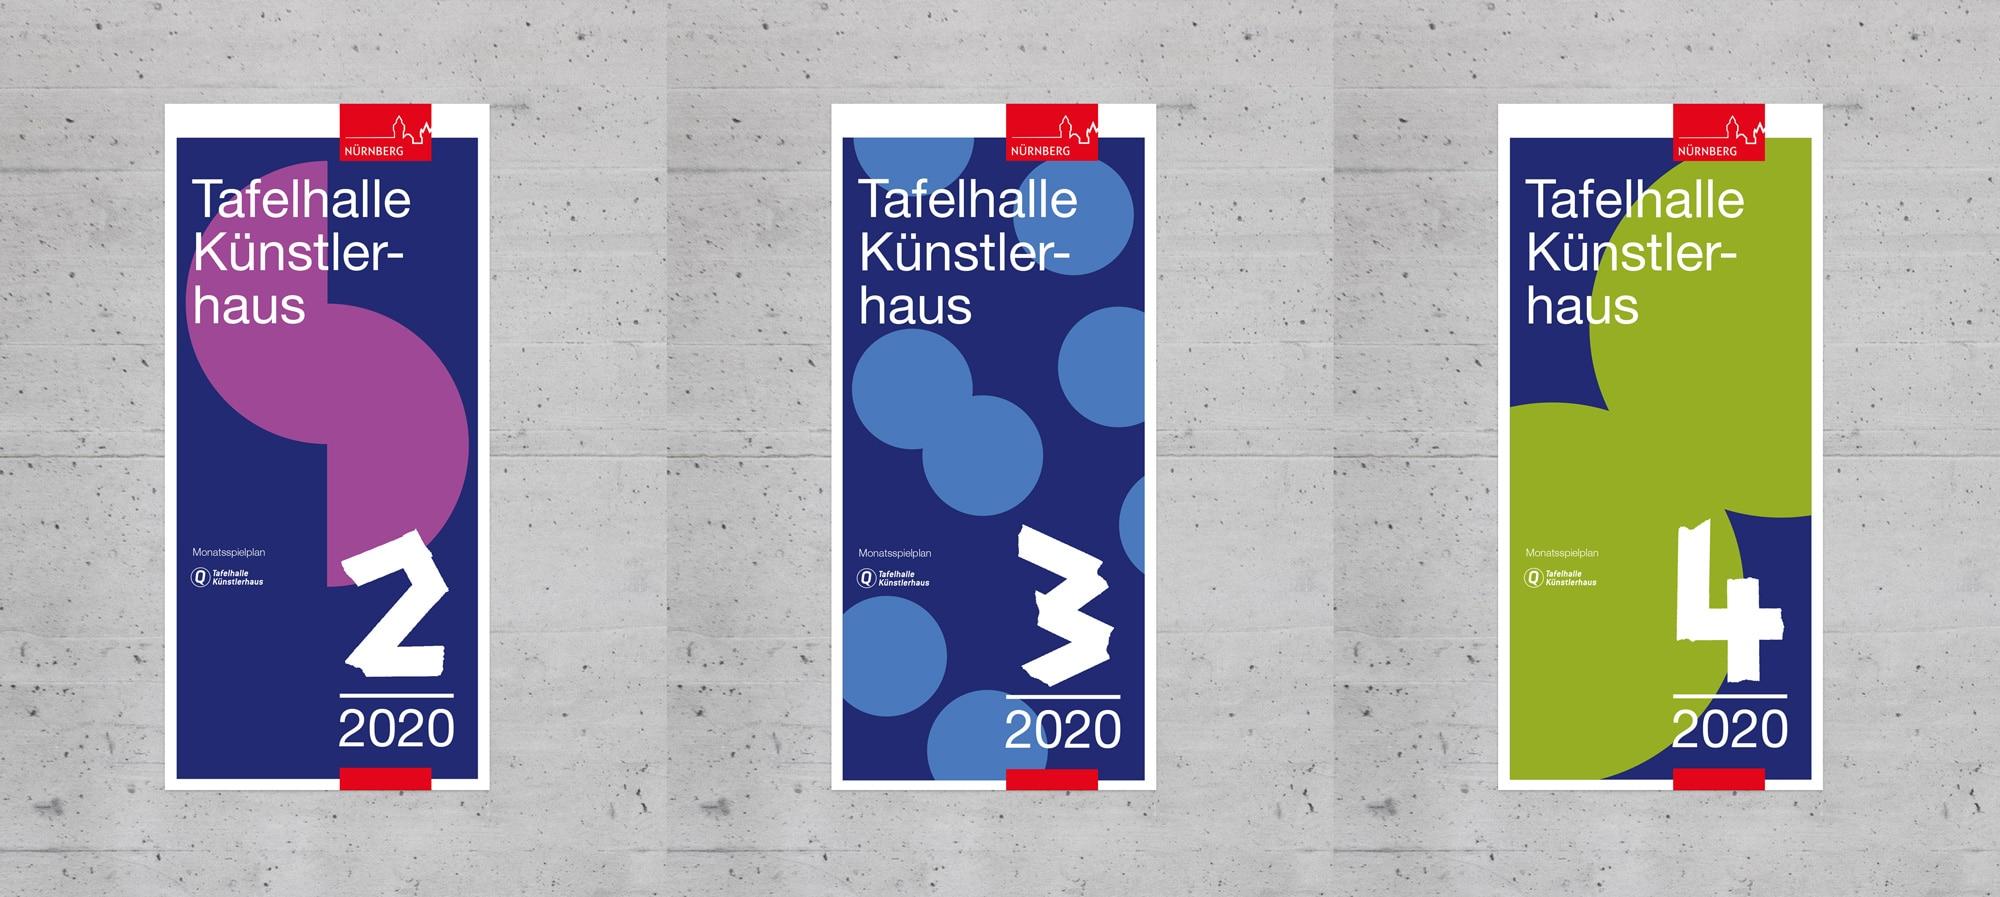 planx-Tafelhalle-2019-20-Selfmailer-TITEL-02